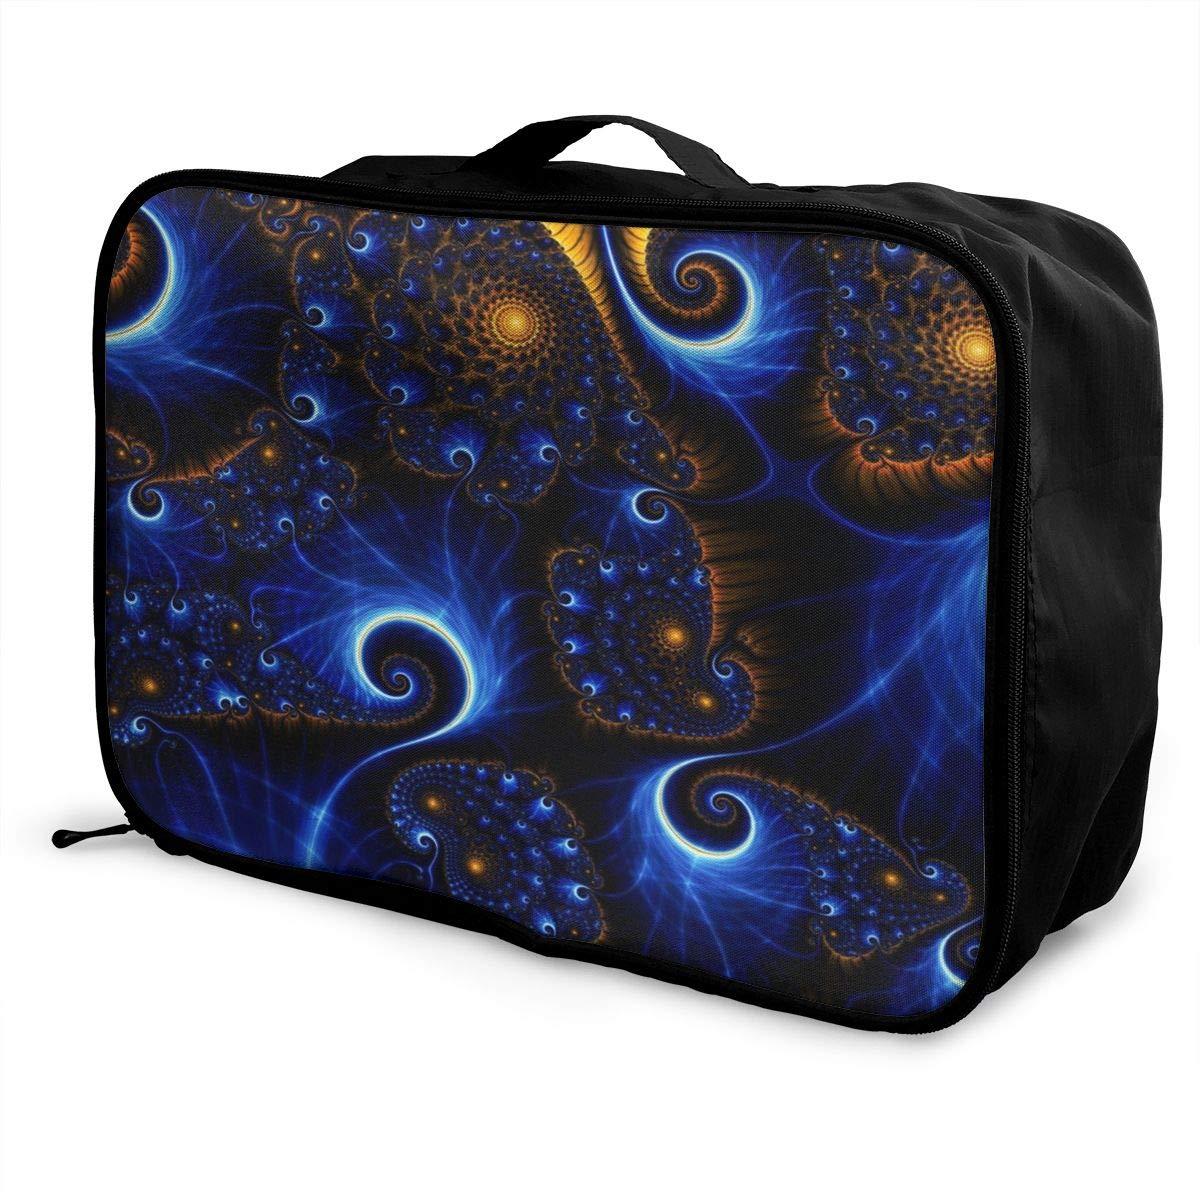 Women /& Men Foldable Travel Duffel Bag Blue Trippy Tie Dye For Luggage Gym Sports